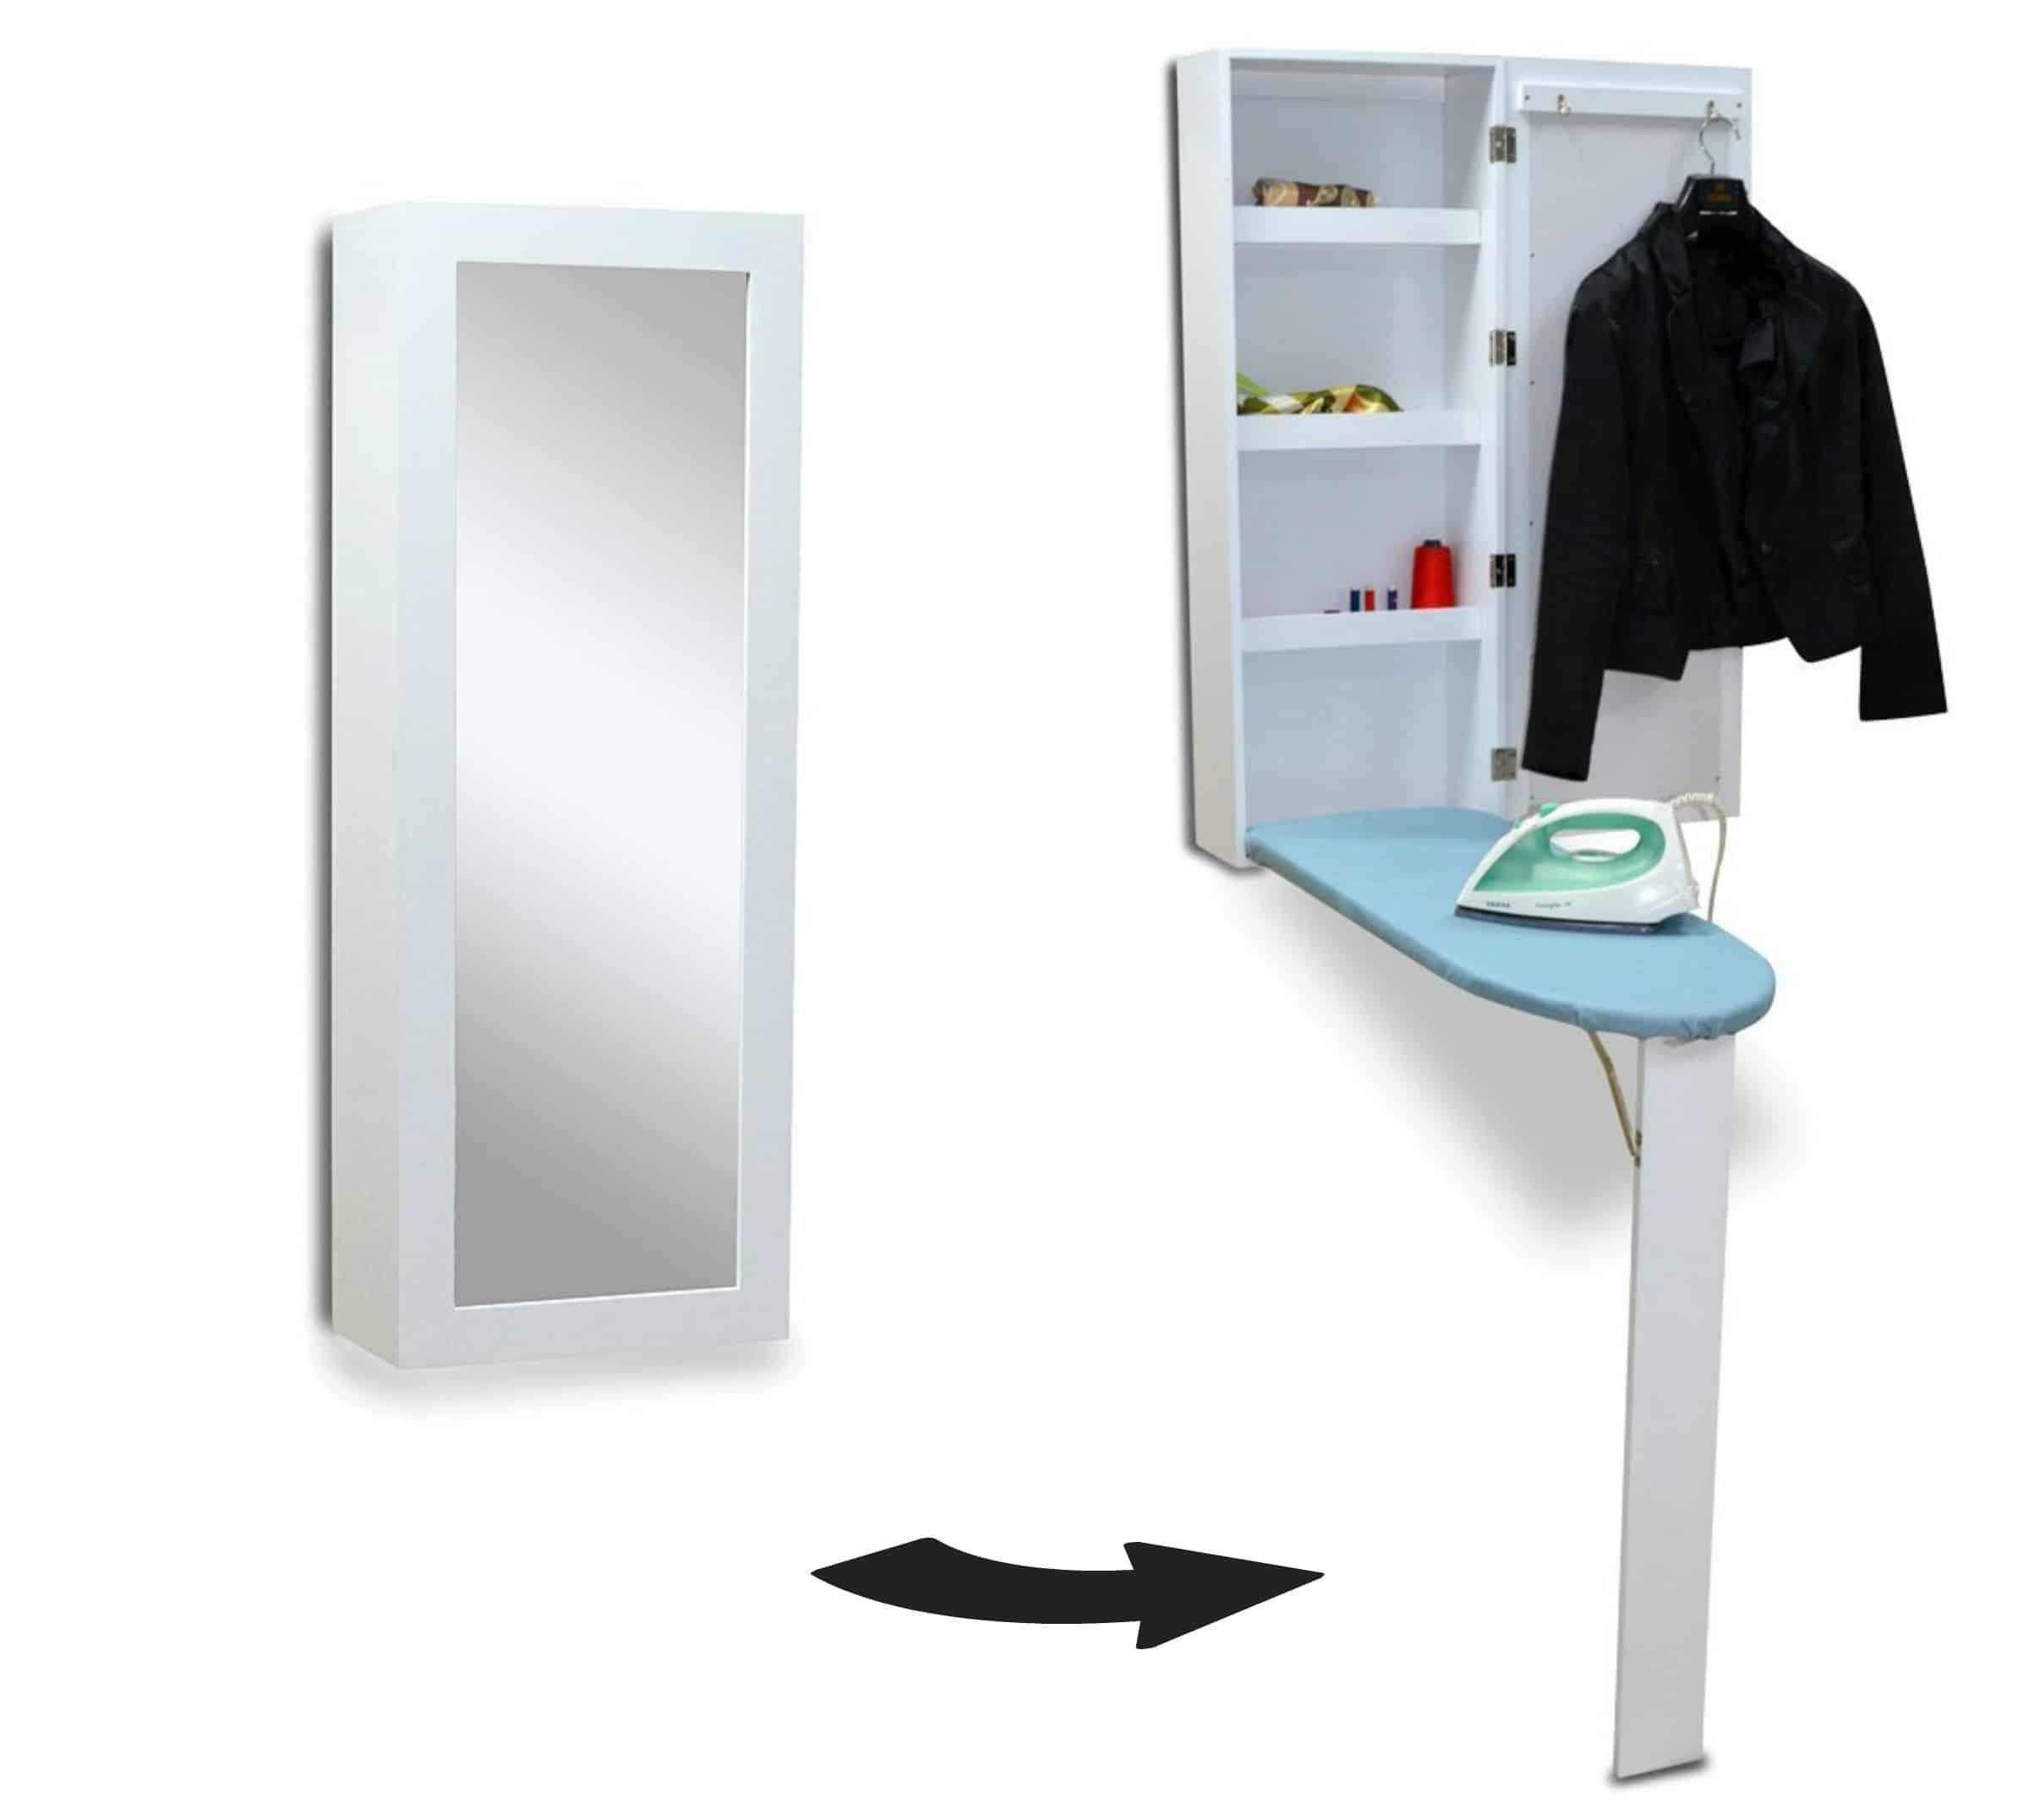 mirror-ironing-board